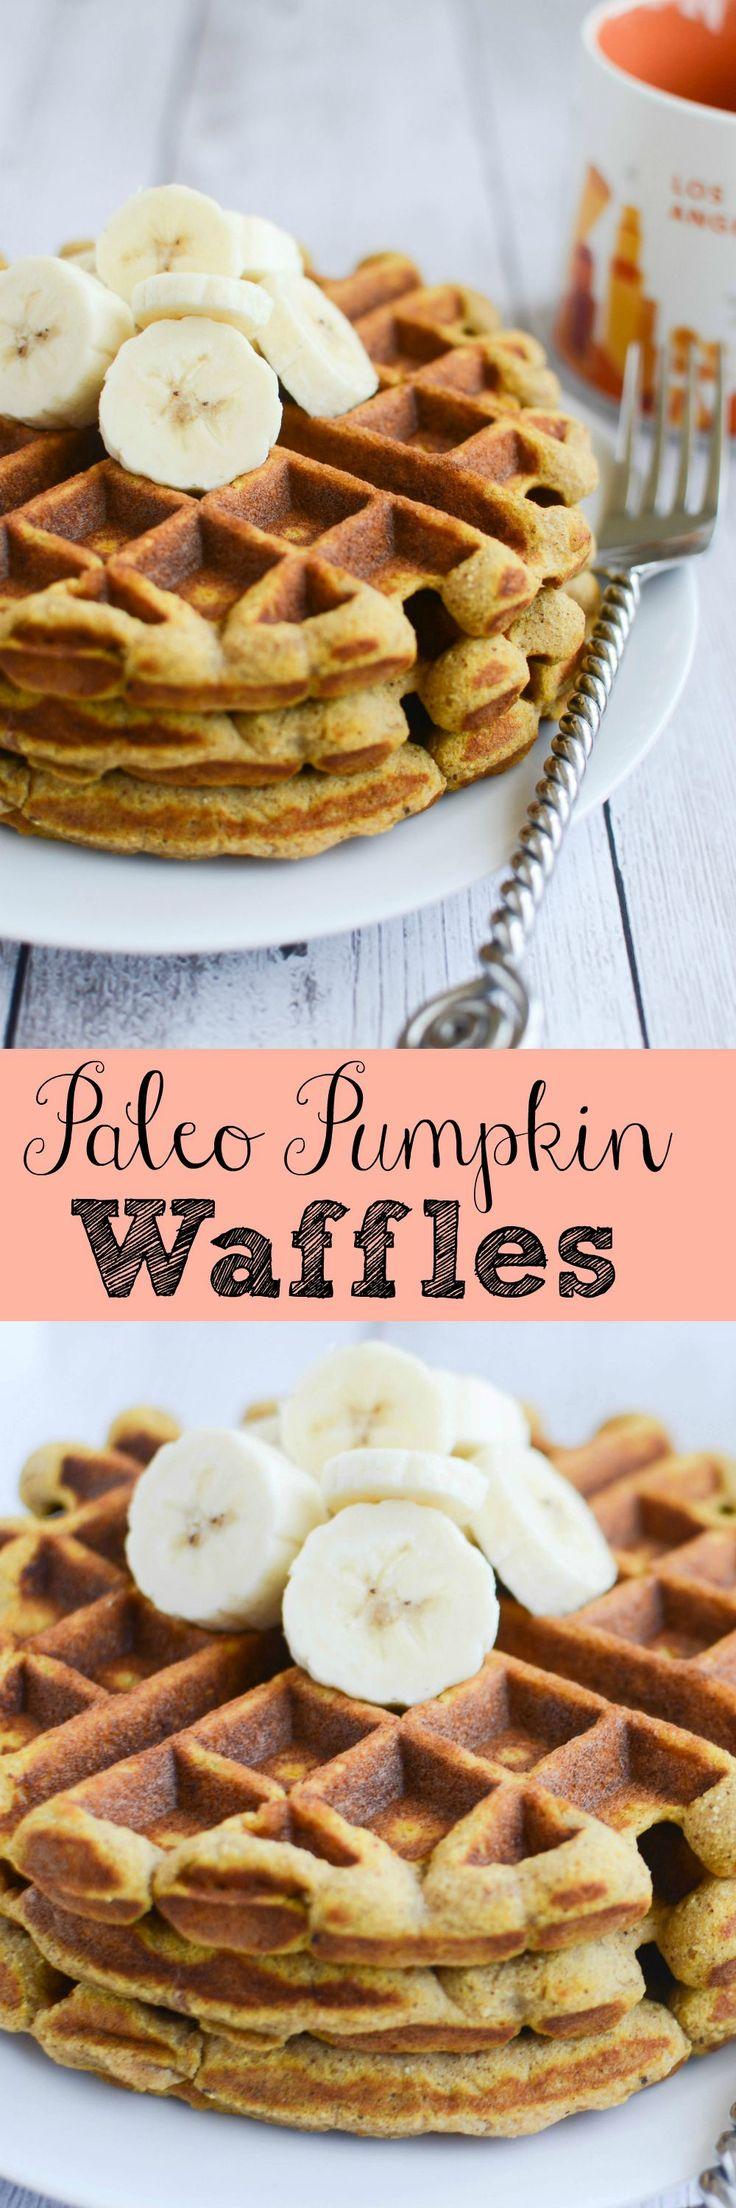 Paleo Pumpkin Waffles - healthy and delicious waffles recipe!